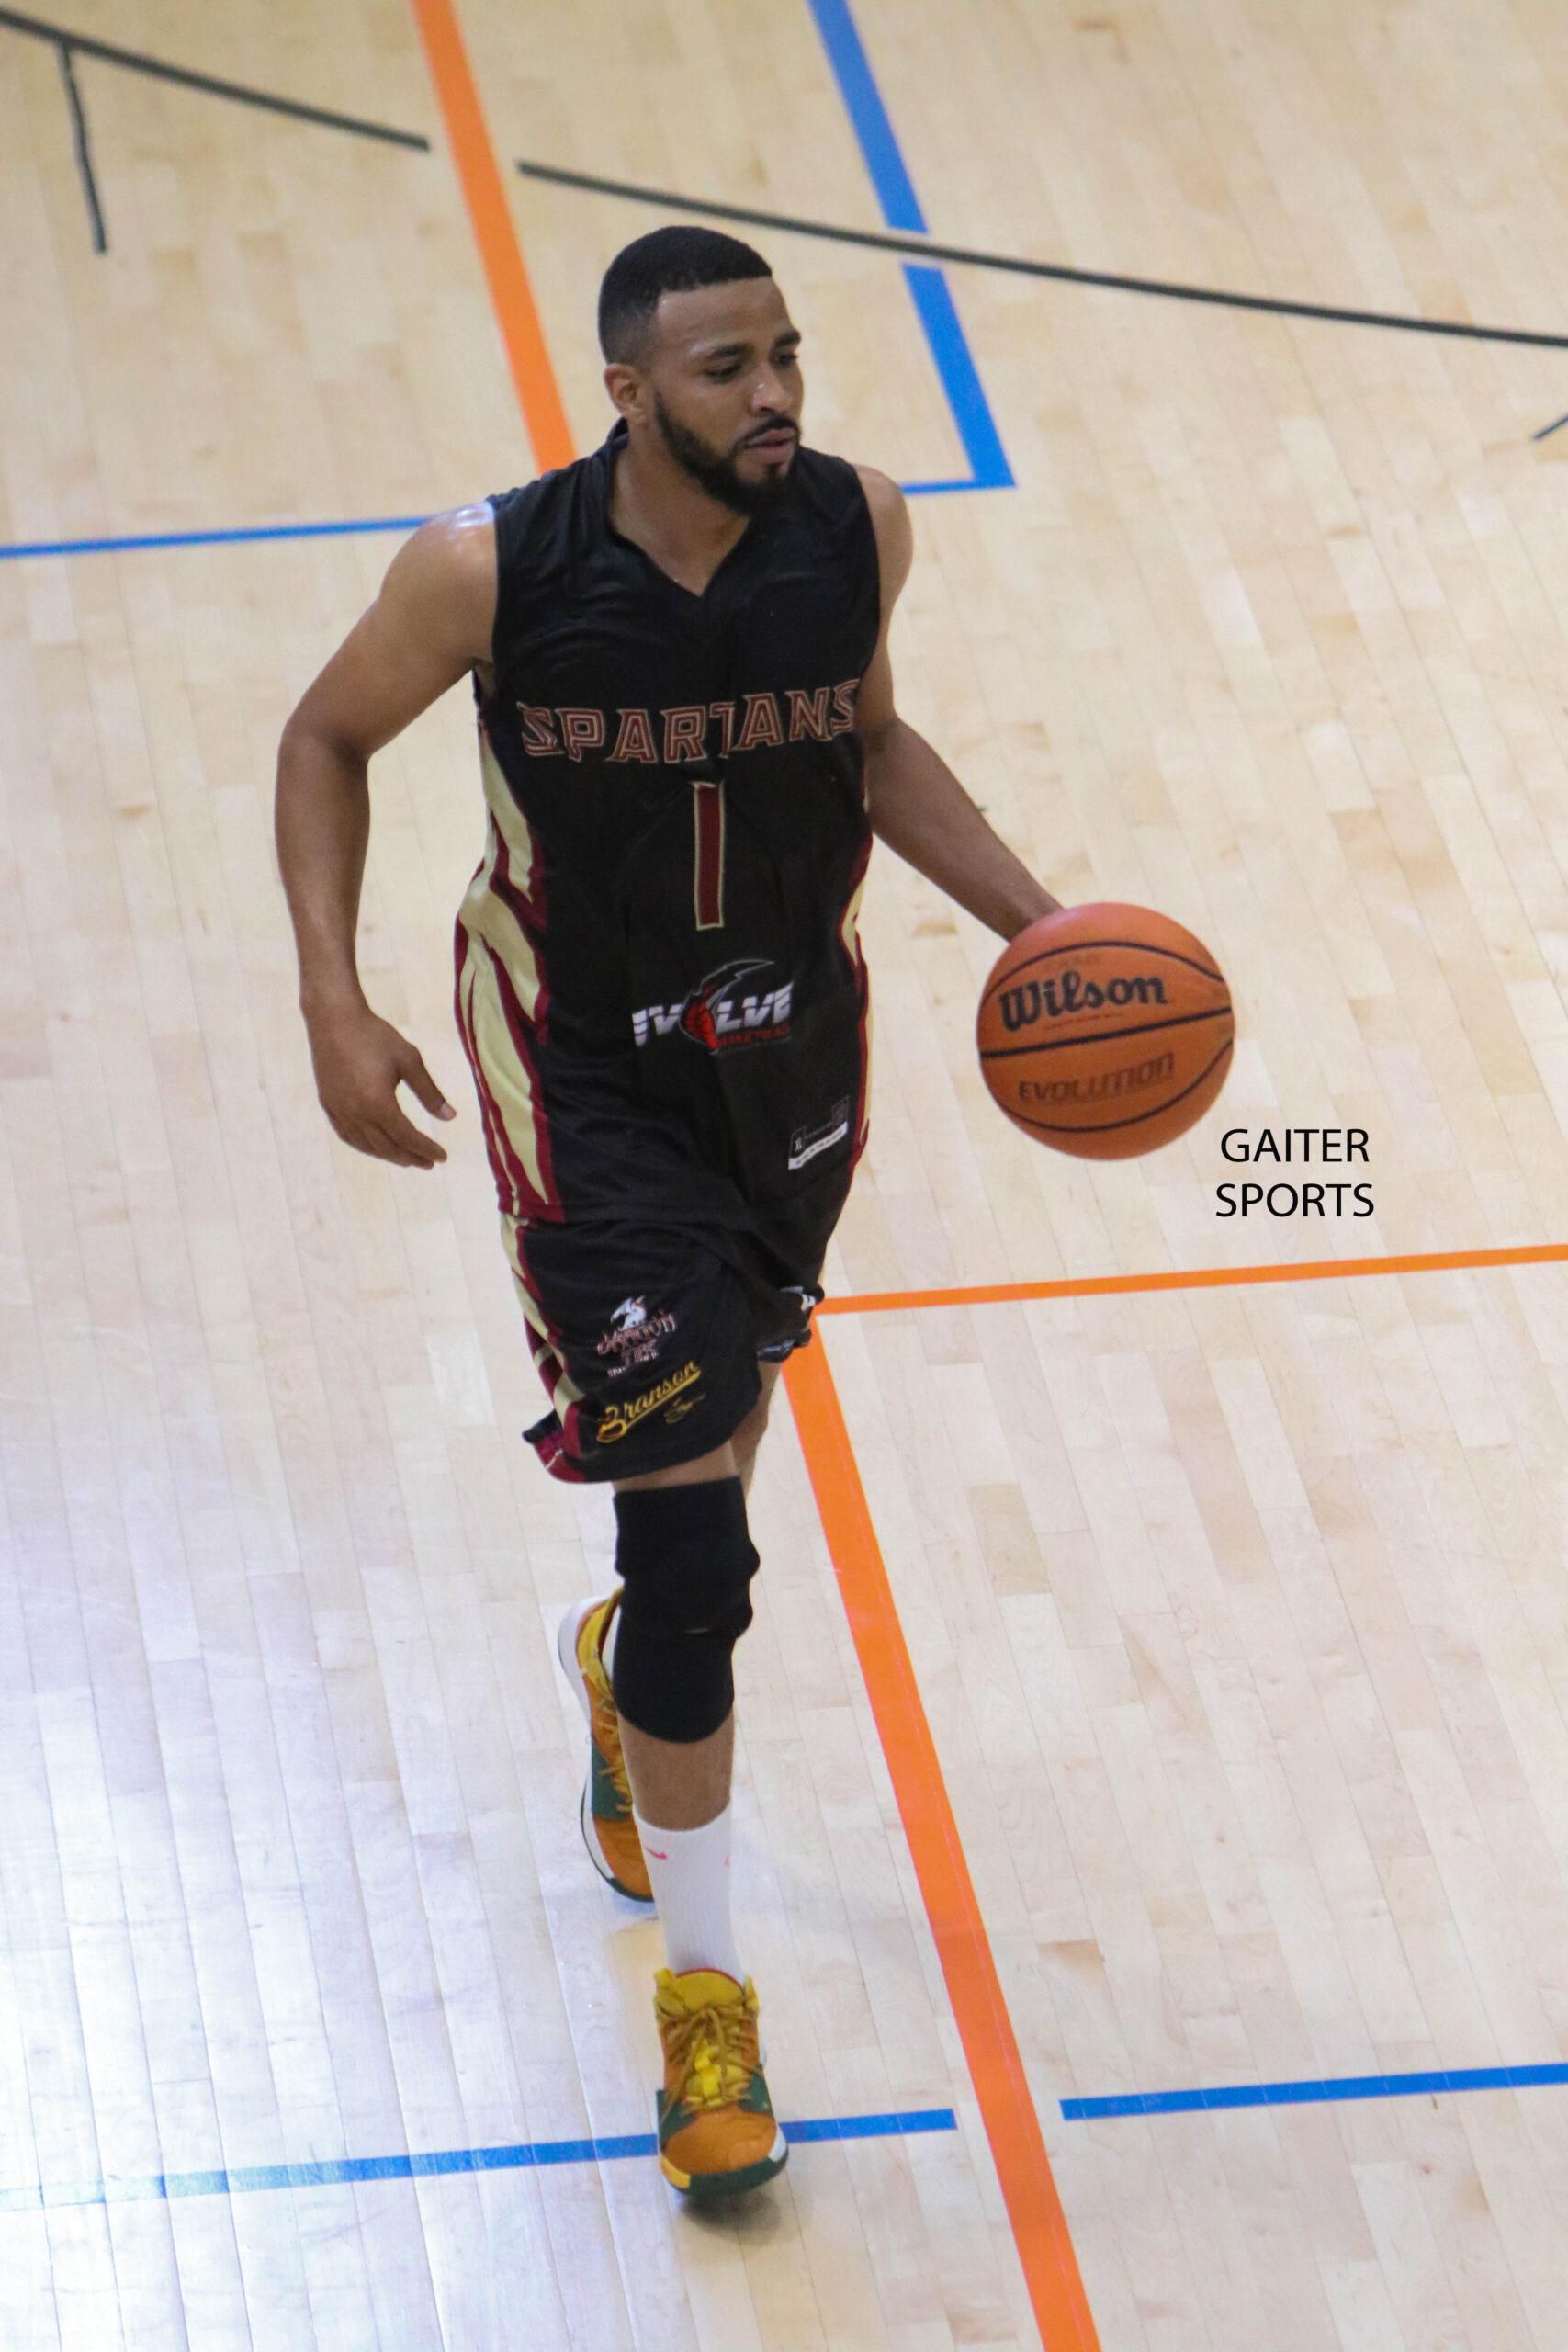 2019 Celebrity Basketball Game Georgia Spartans 24 Tony Brown